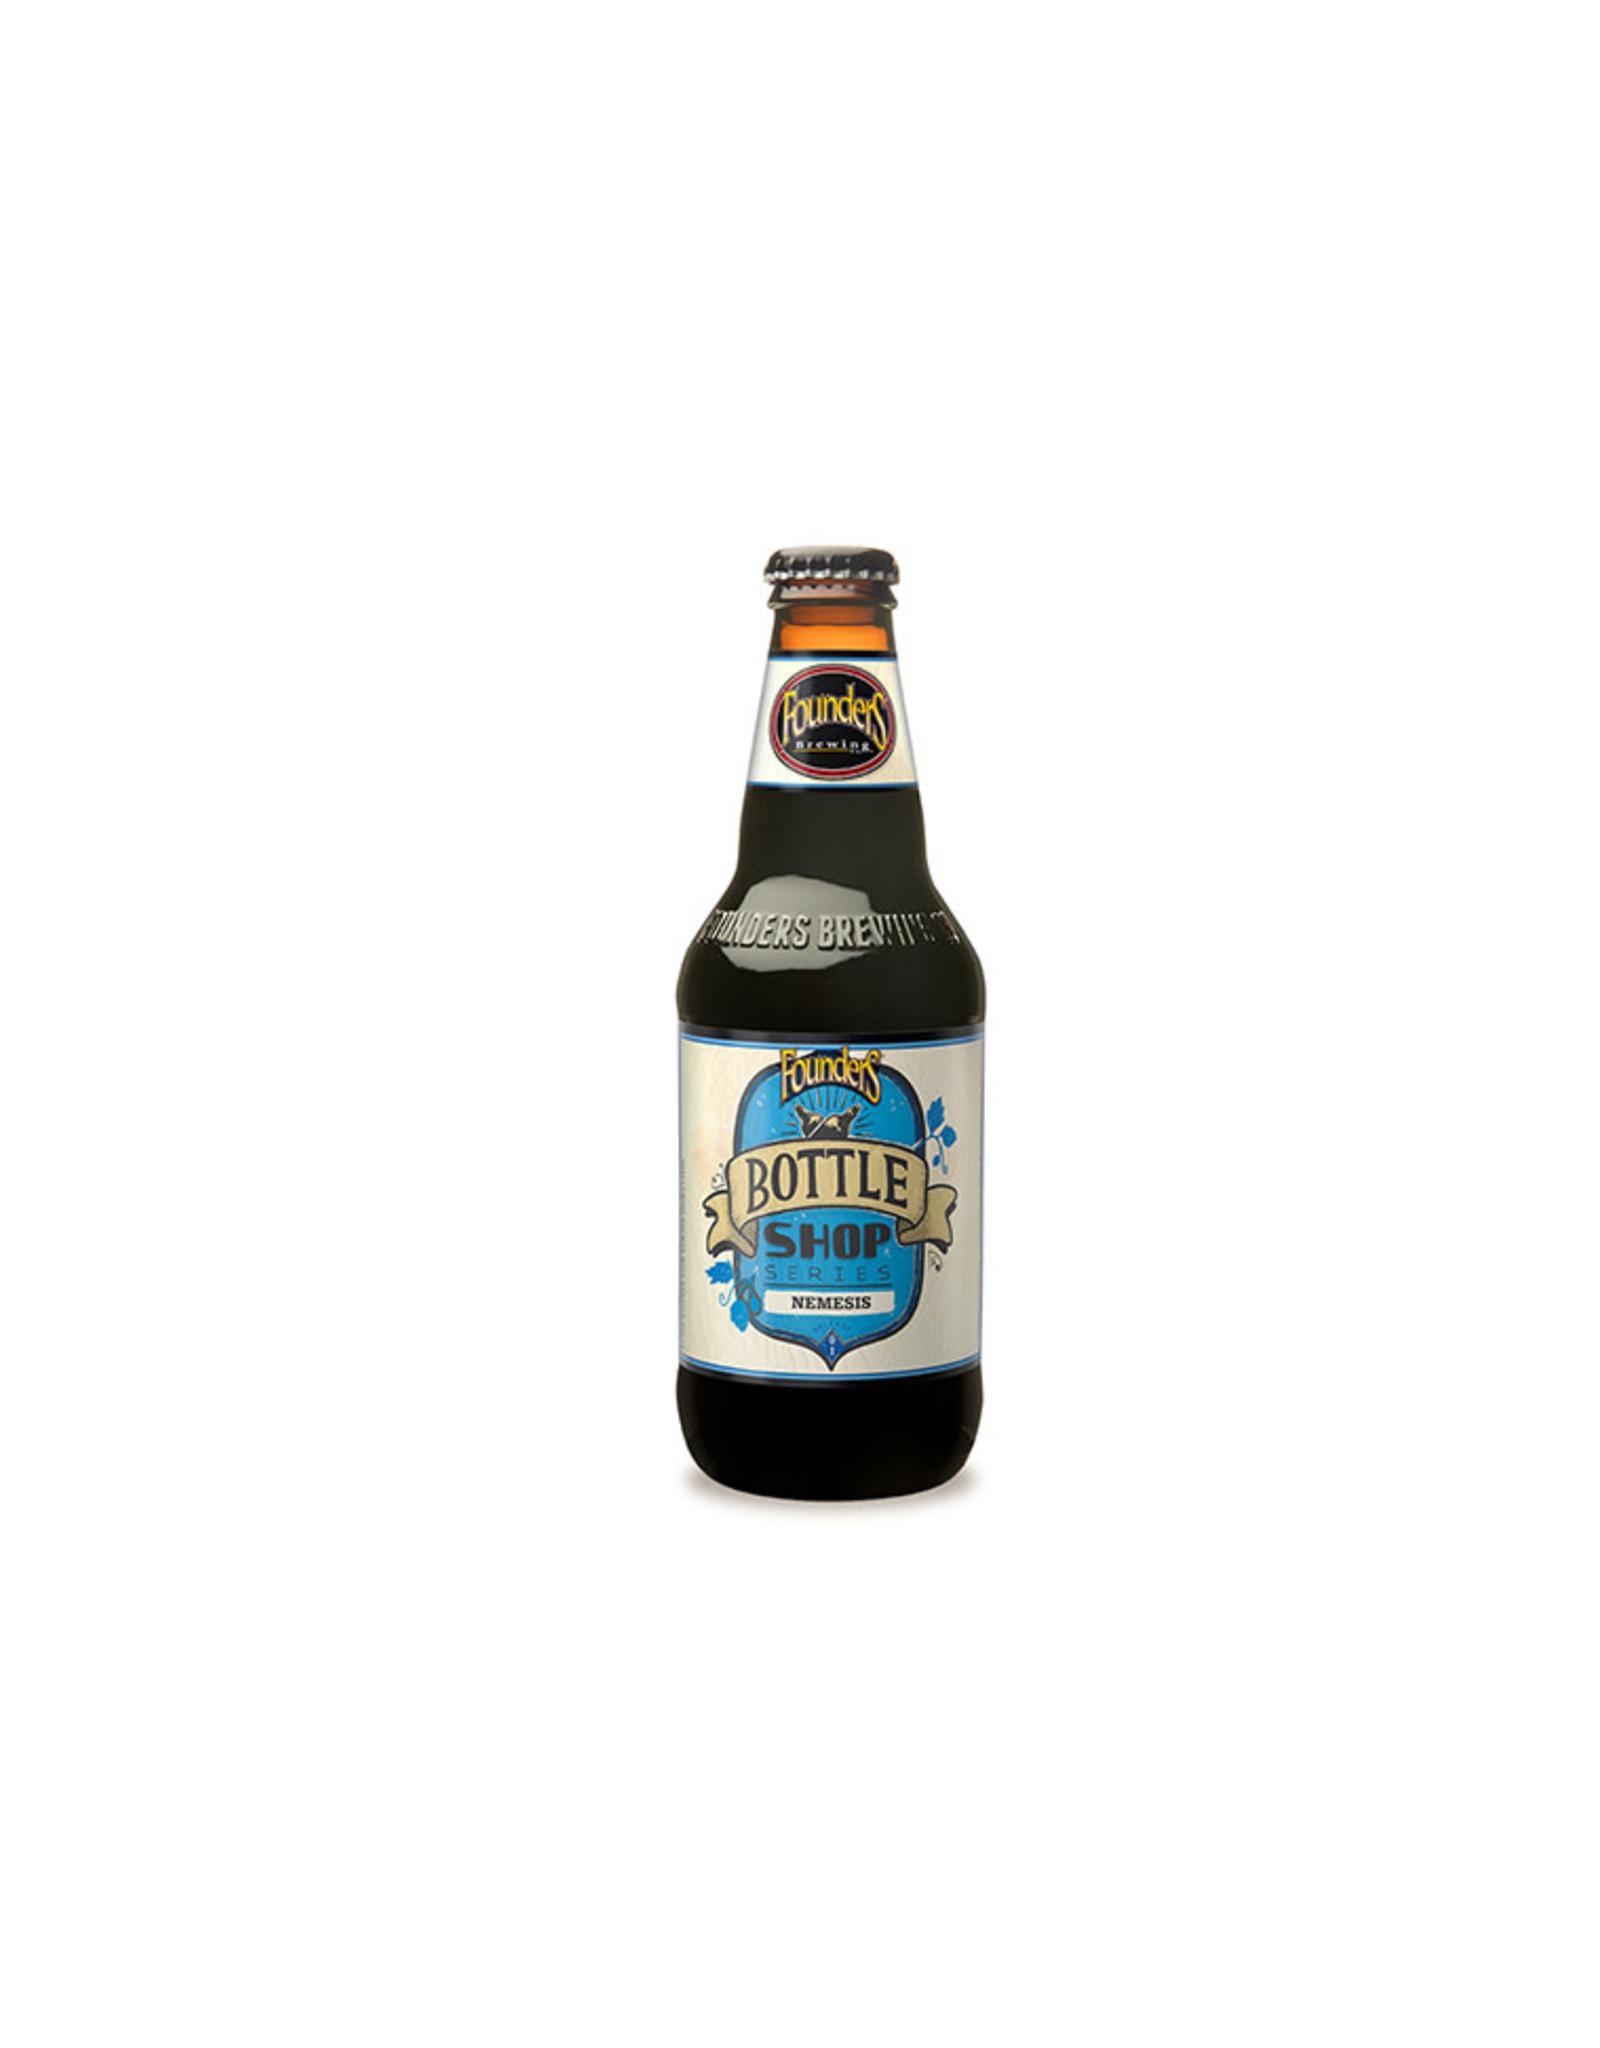 Founders Founder's Bottle Shop Series, Nemesis Barleywine-Style Ale